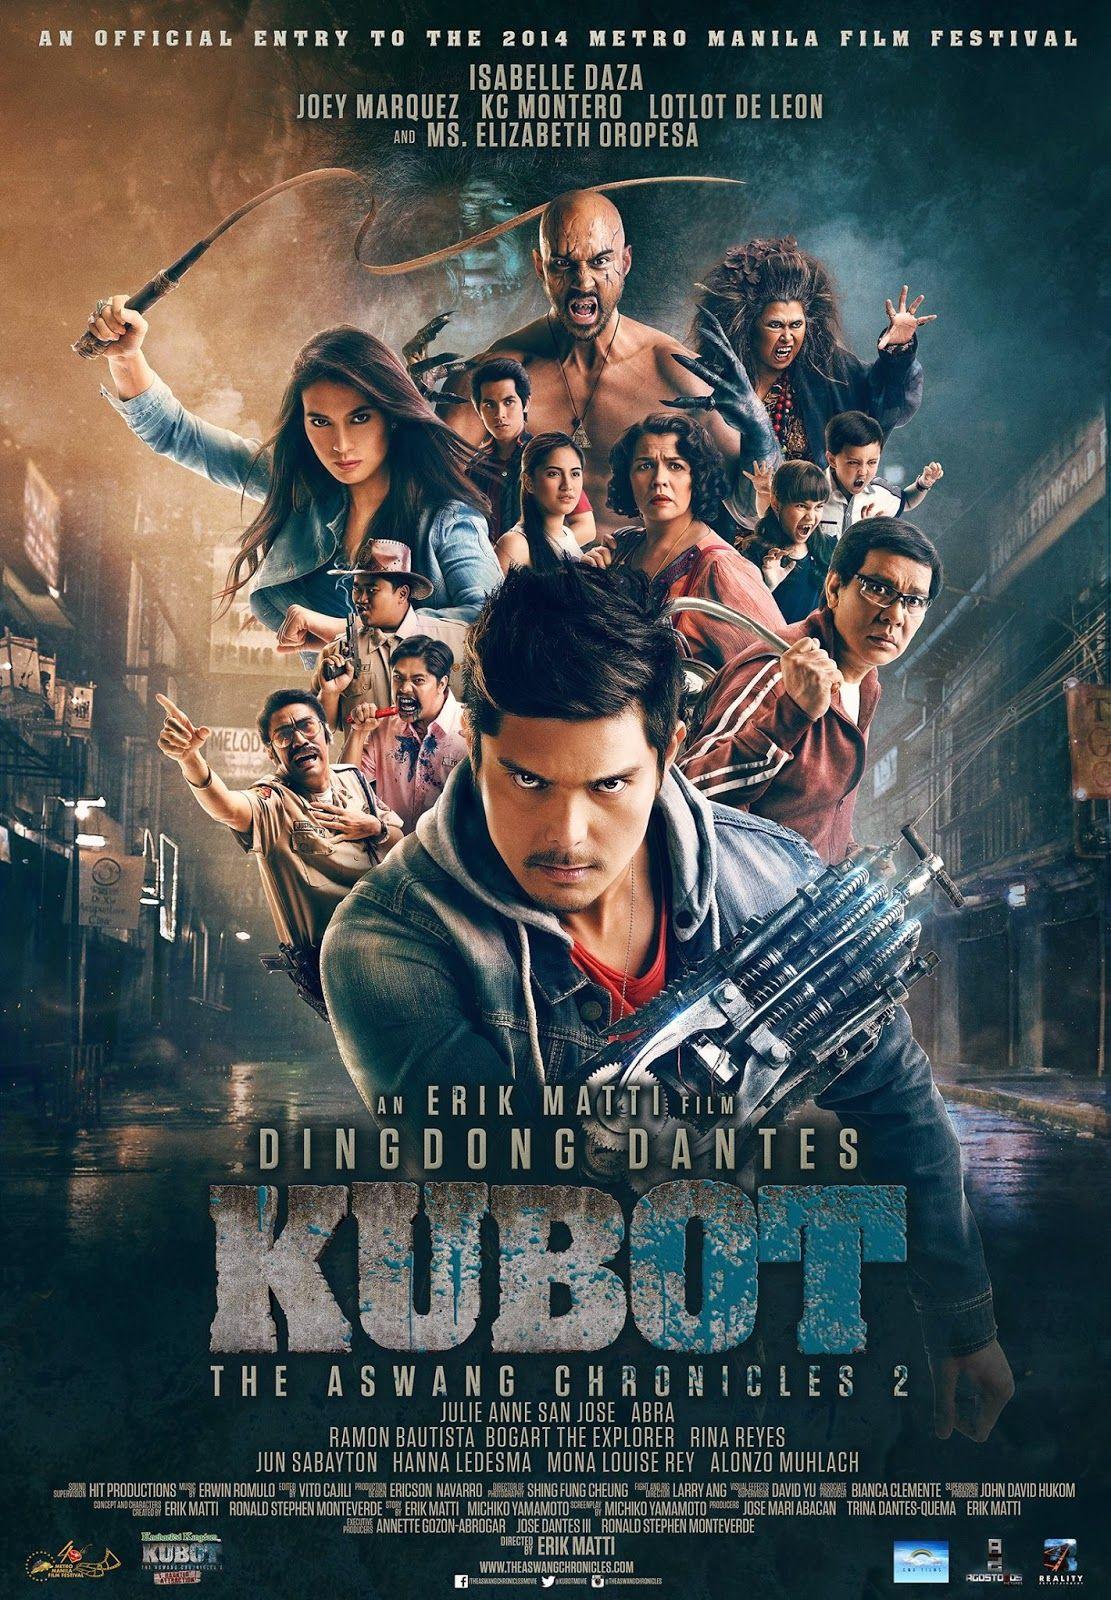 Kubot the aswang chronicles 2 is a 2014 filipino action